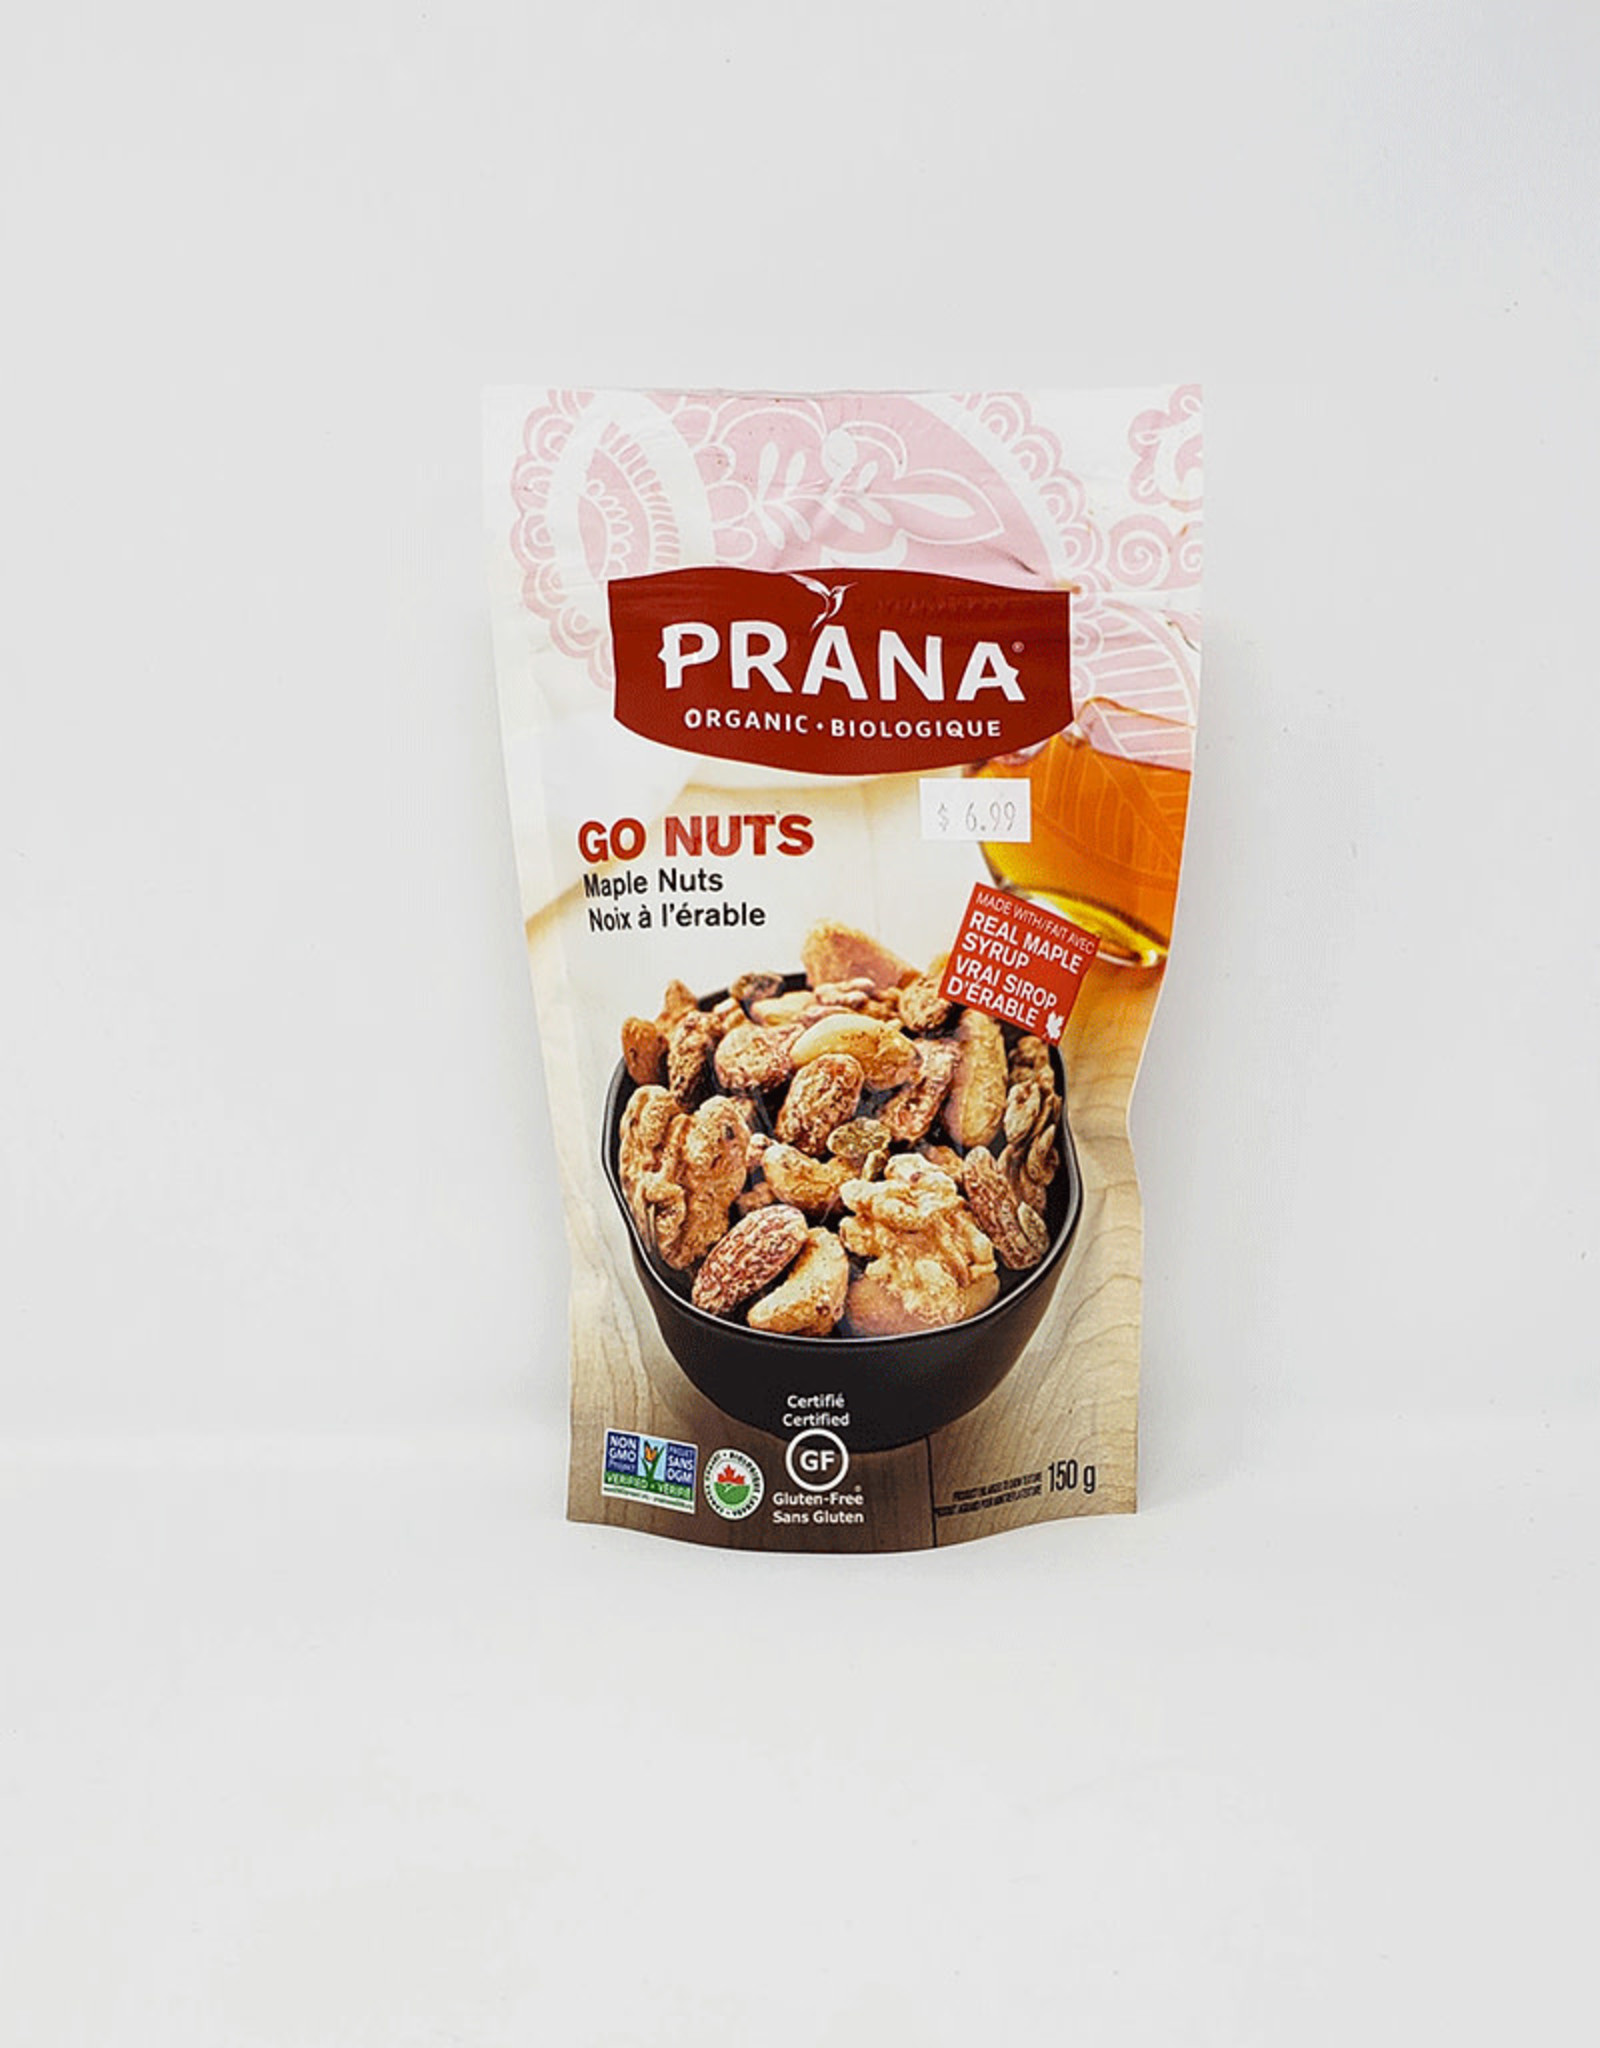 Prana Prana - Sweet Nut Mix, Go Nuts Maple Nuts (150g)